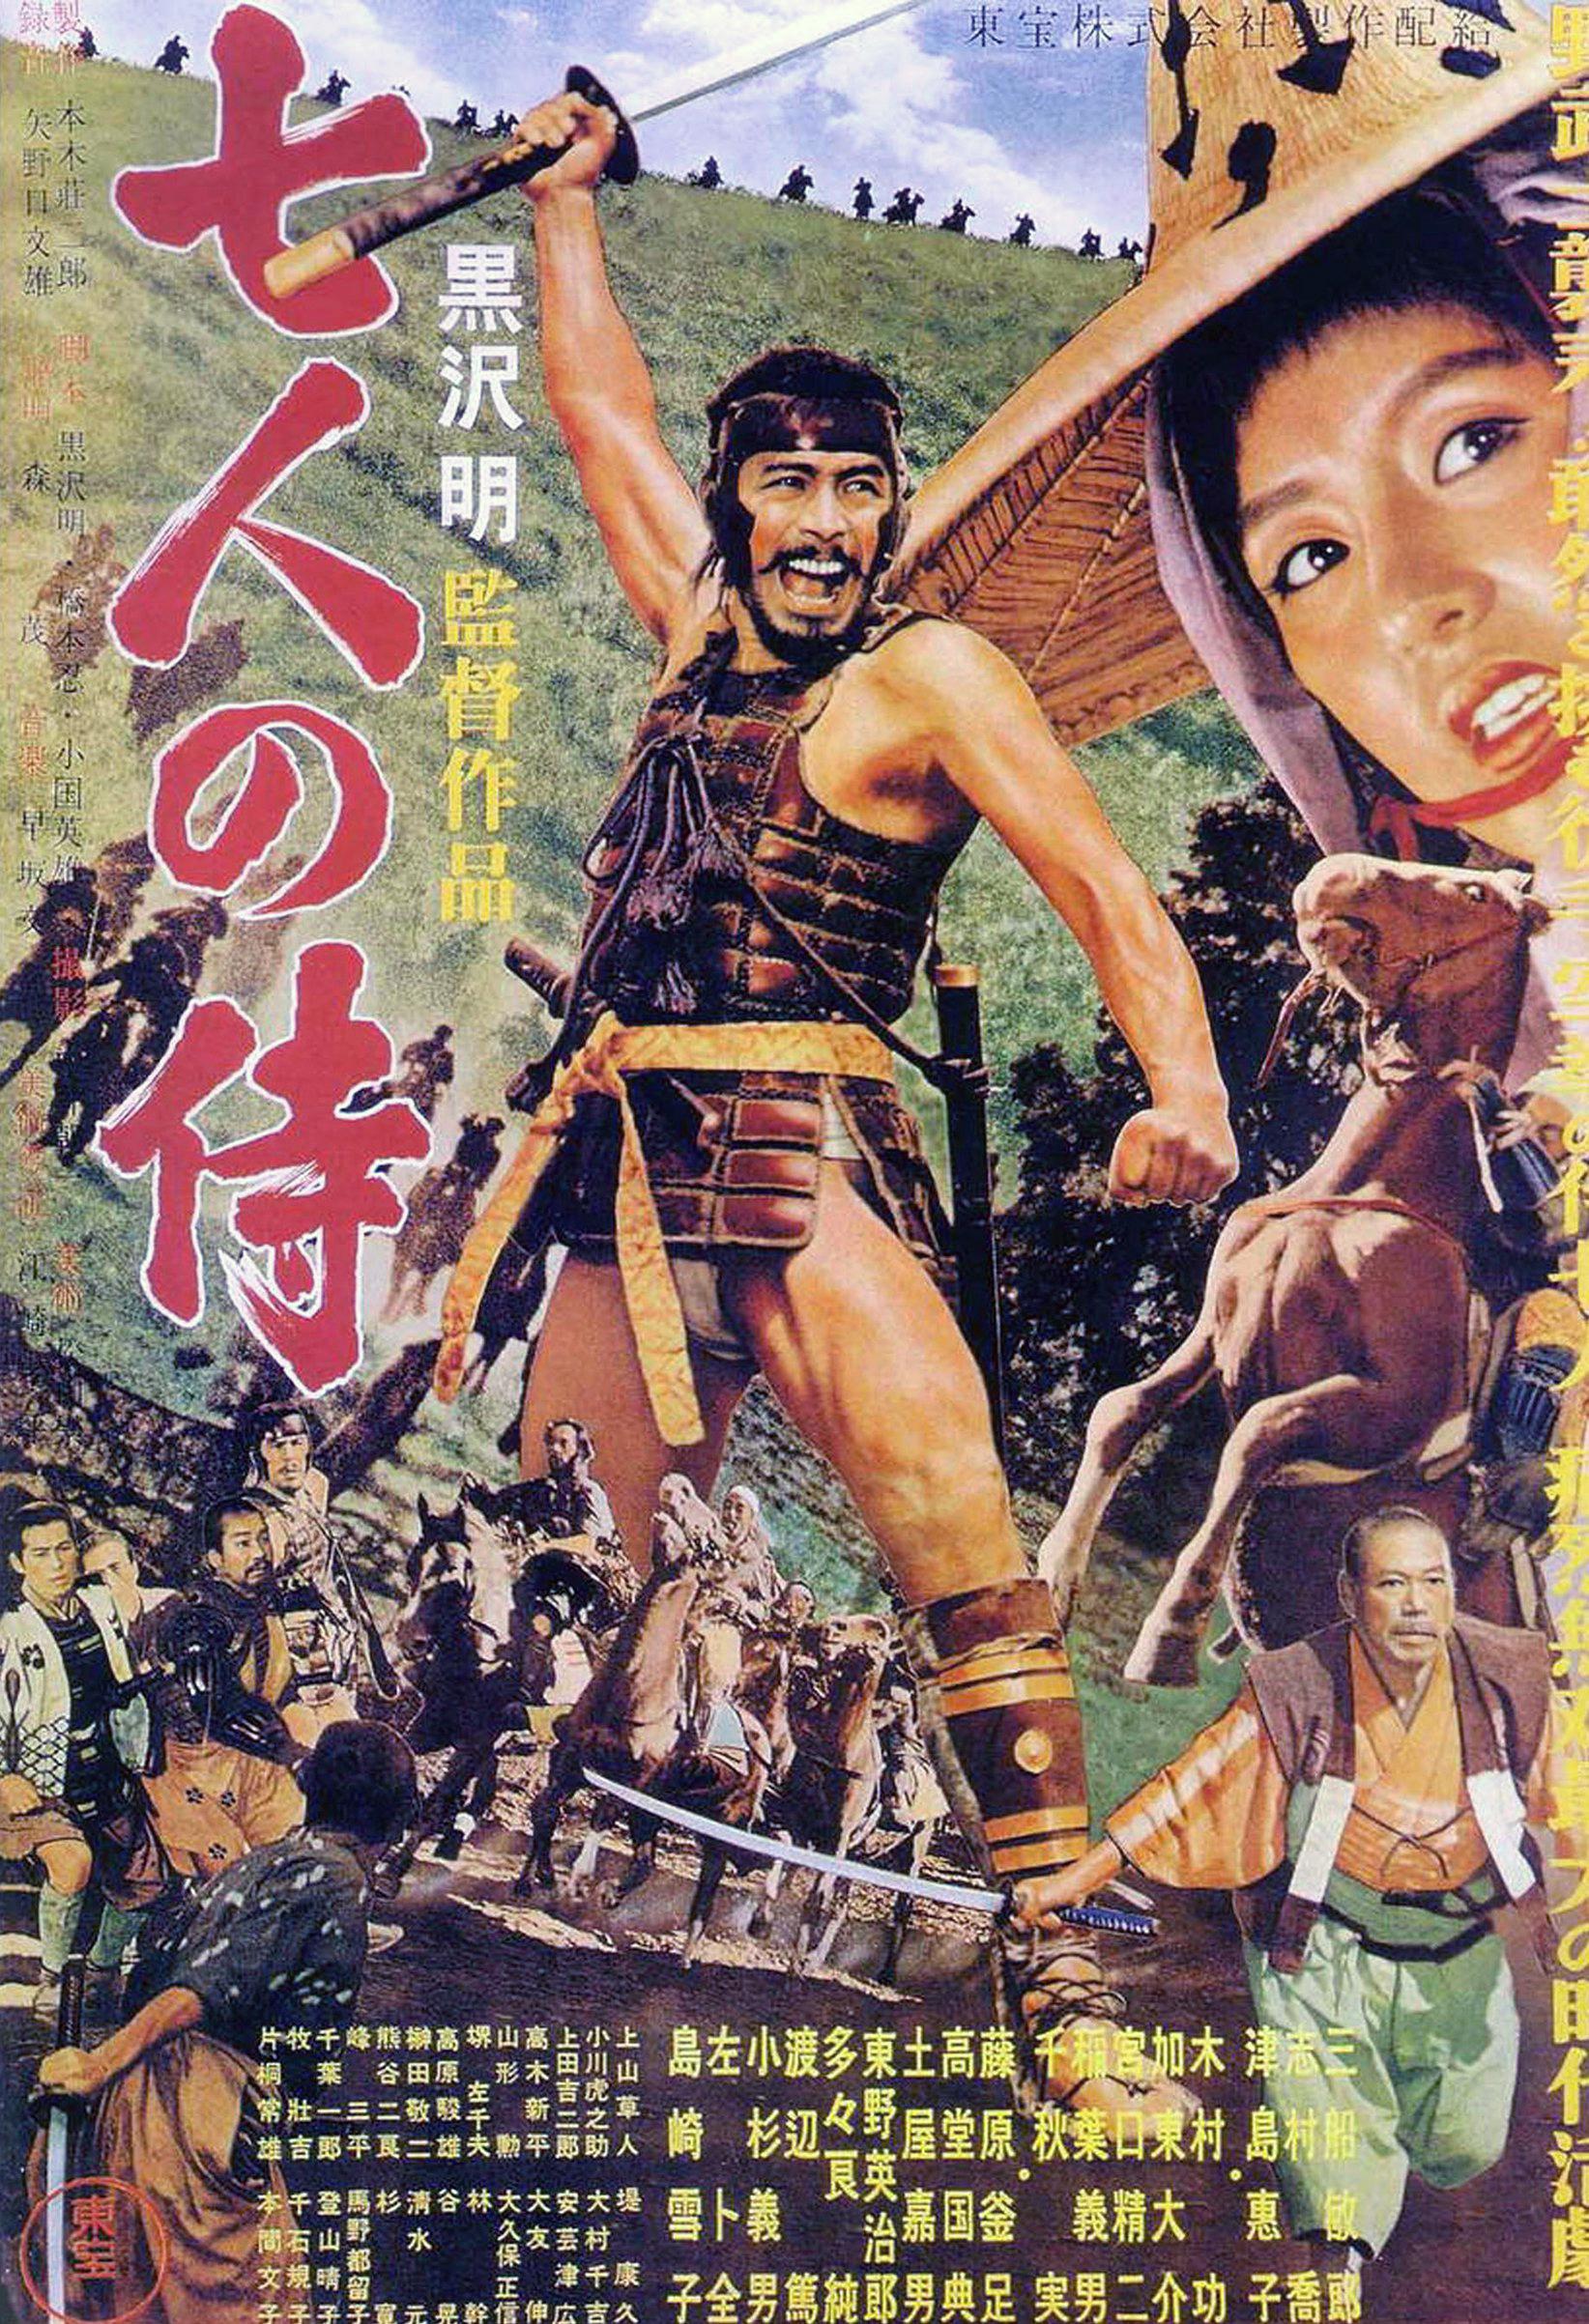 Bushido : shinobu-hashimoto-seven-samurai-screenplay-writer-japan  bij ki club.cool karateschool in Amsterdam Centrum en Monnickendam voor traditioneel Shotokan karate-do.